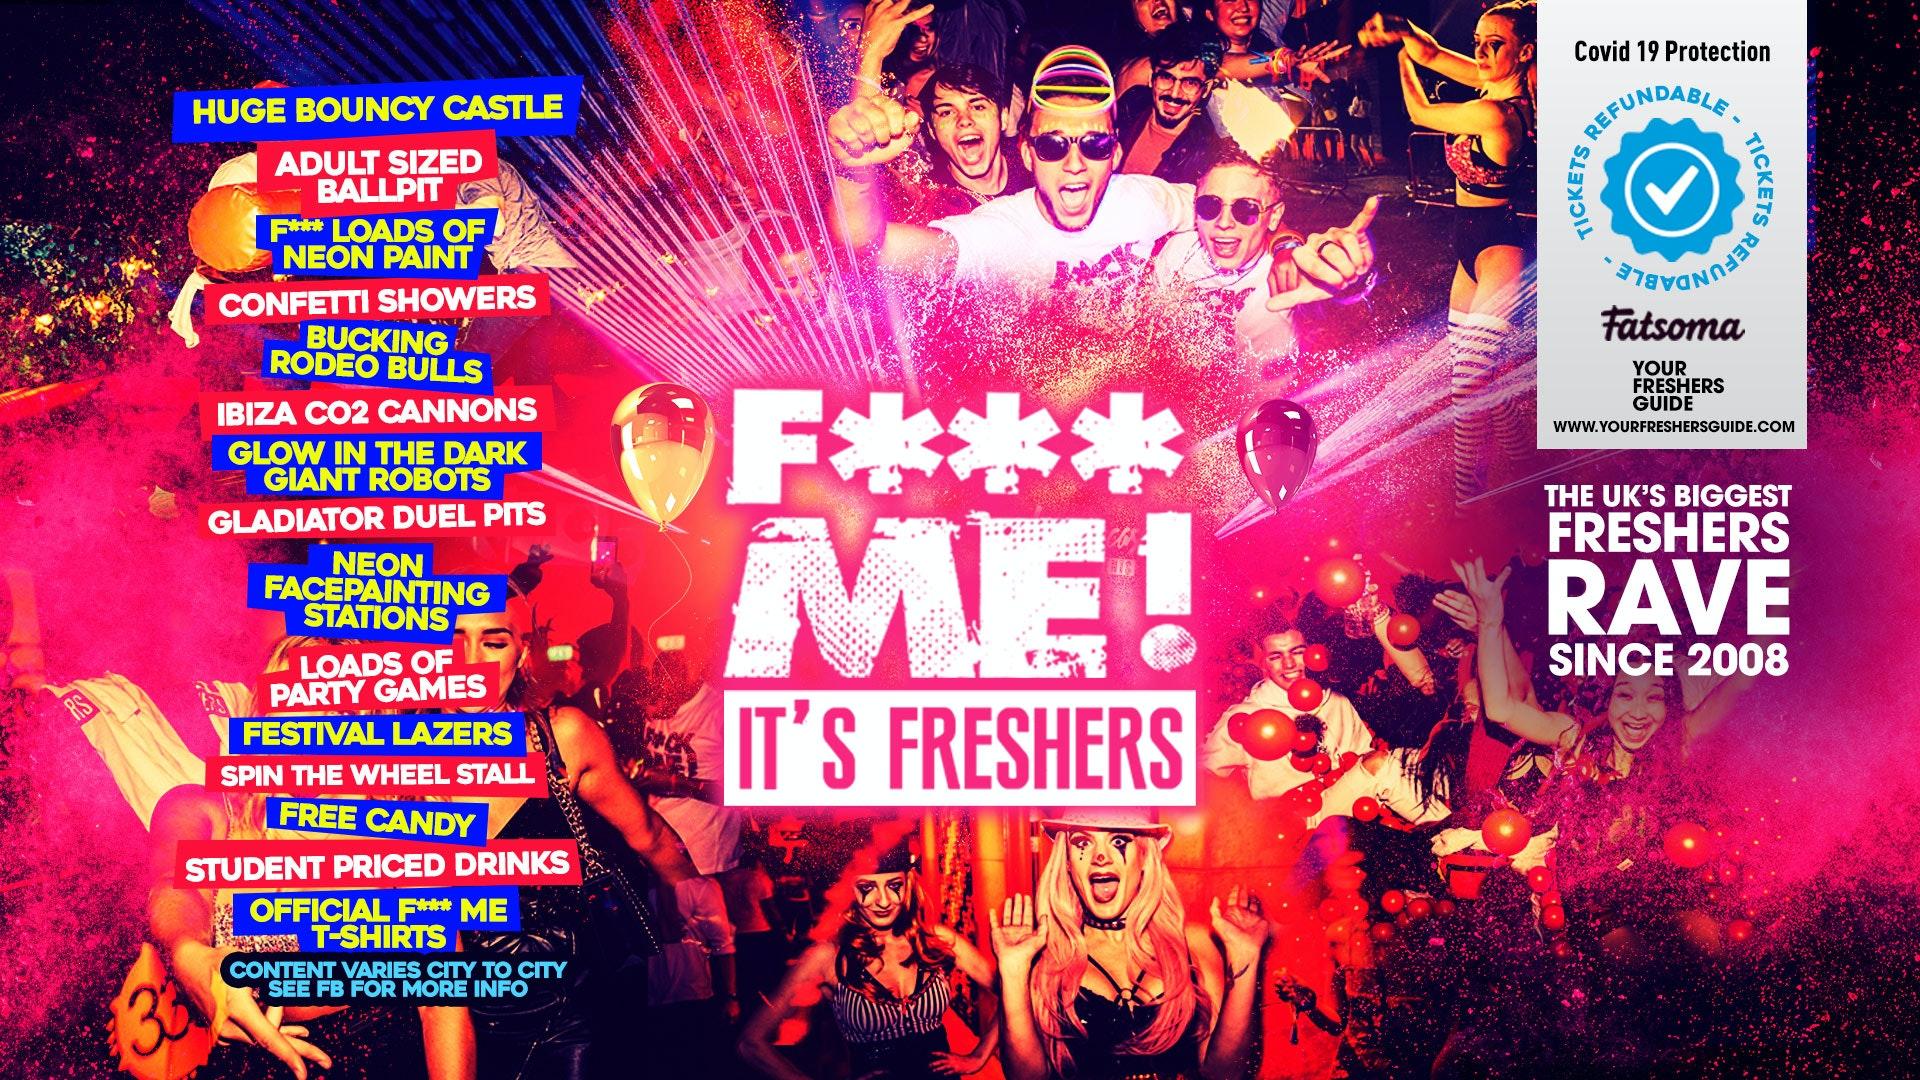 FME It's Freshers // Brighton Freshers 2020